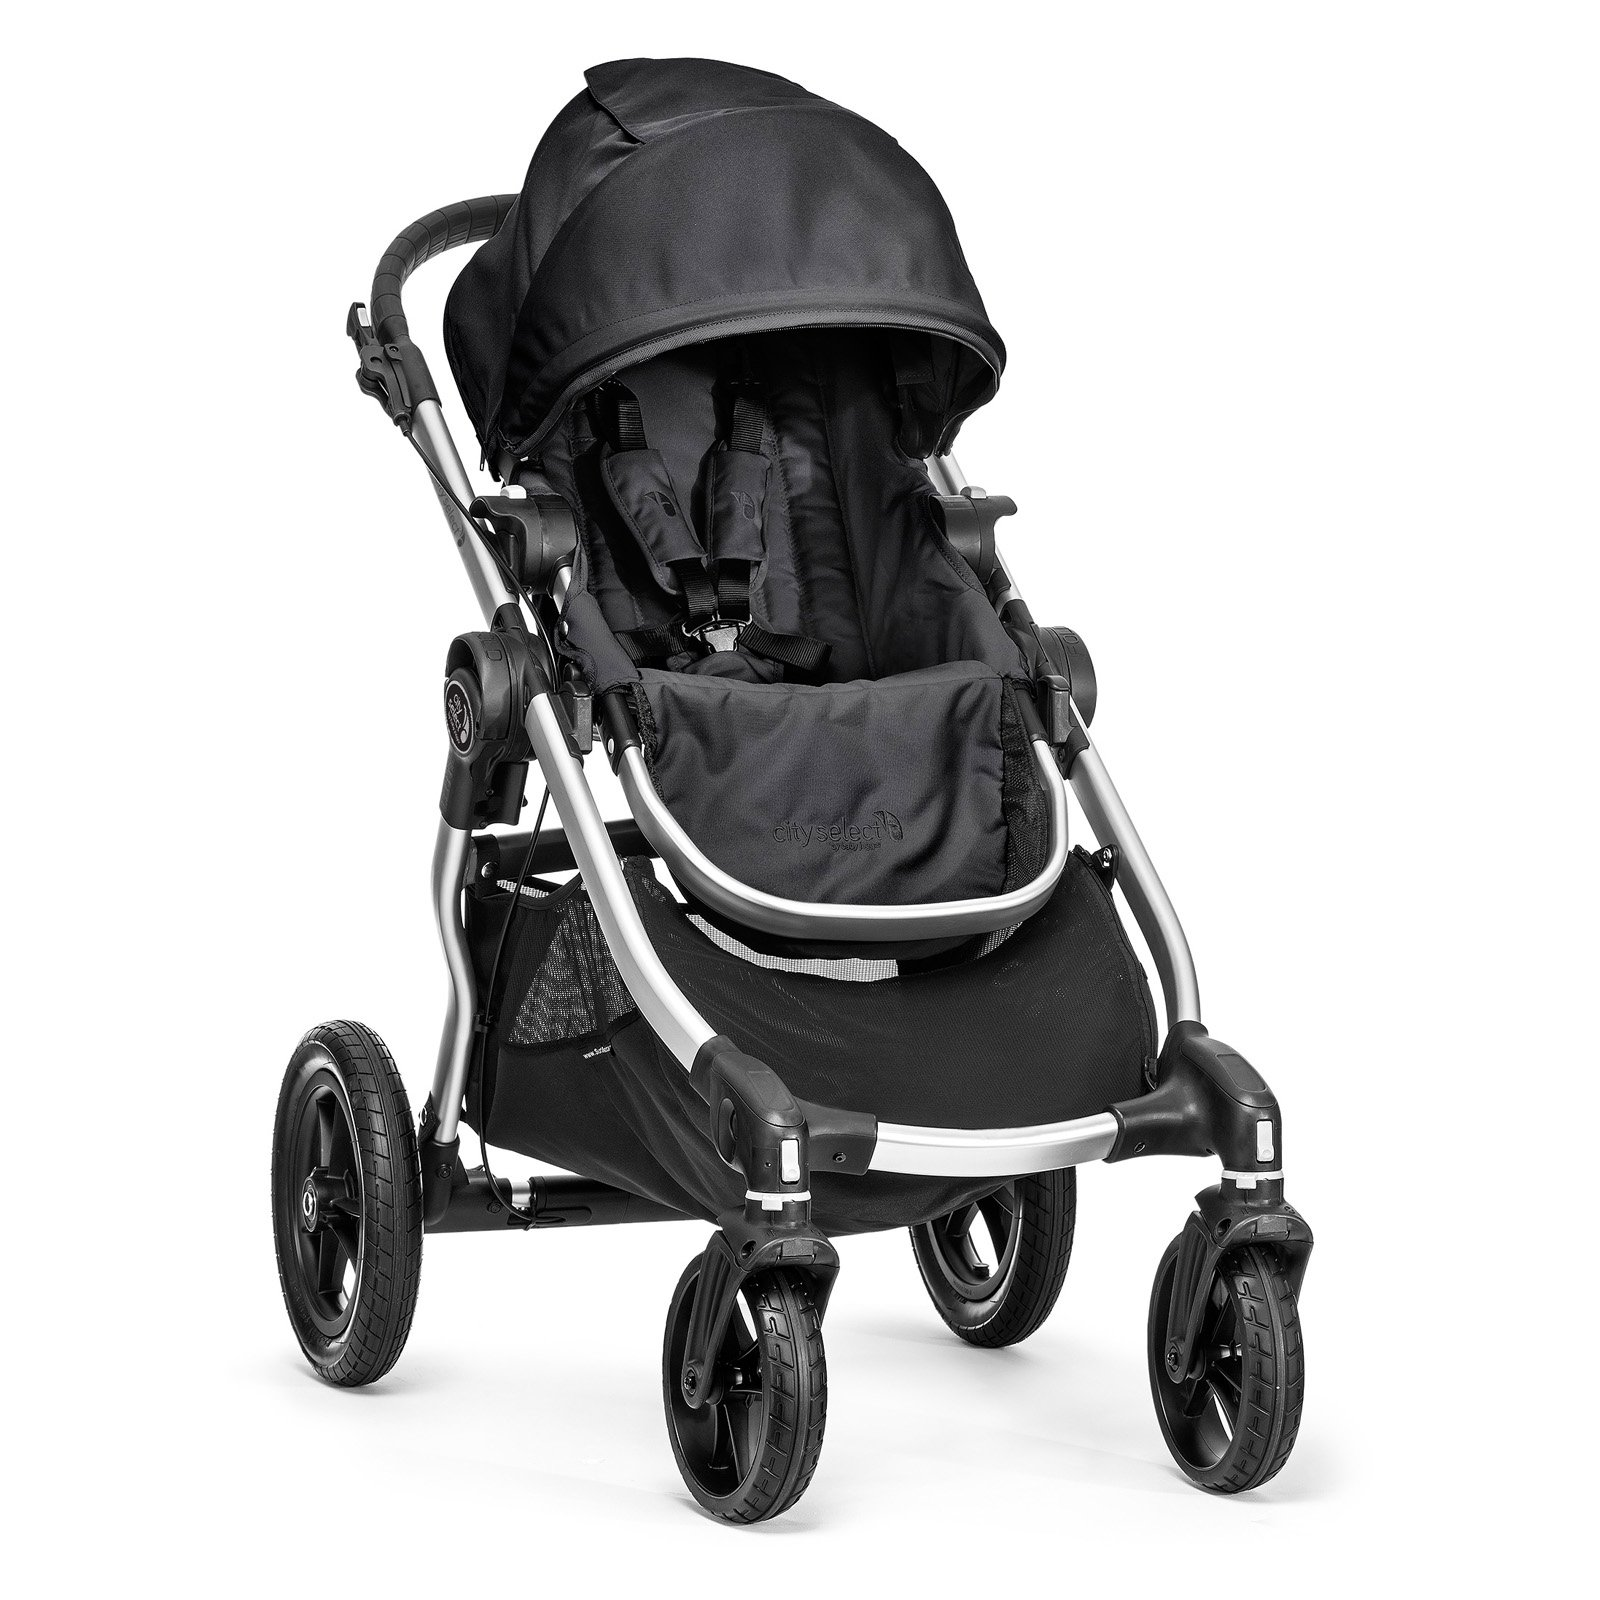 Baby Jogger 2016 City Select Single Stroller- Onyx